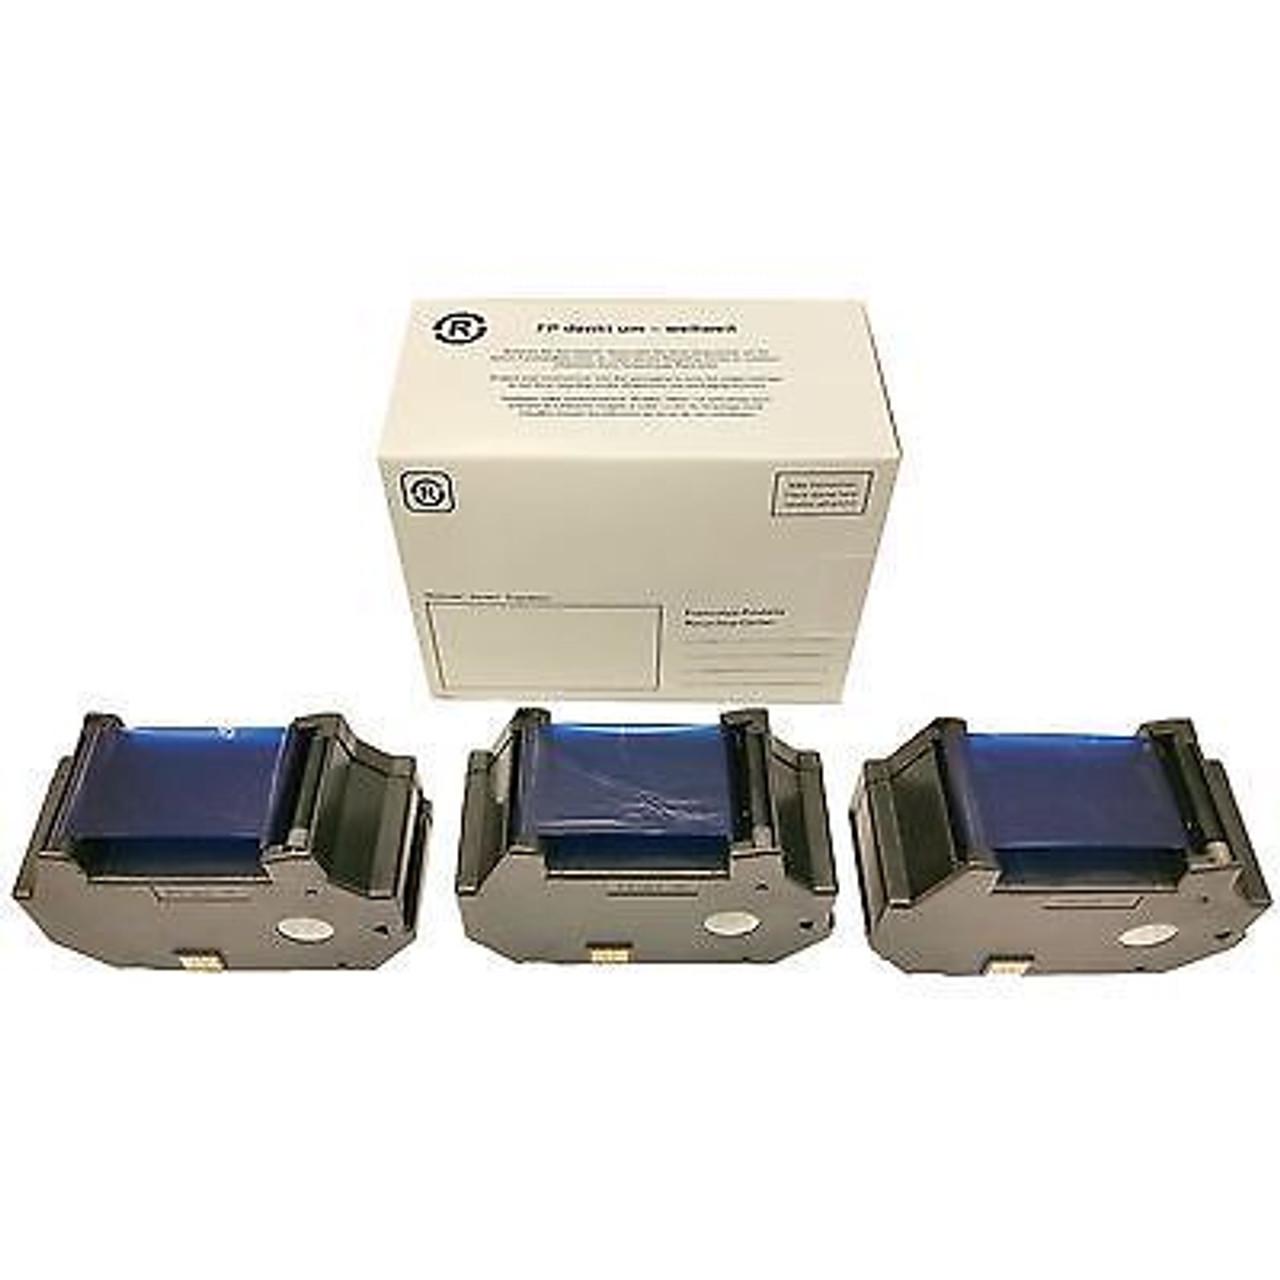 Original Francotyp Postalia FP OptiMail 30 Ink Cartridge - 3 Pack